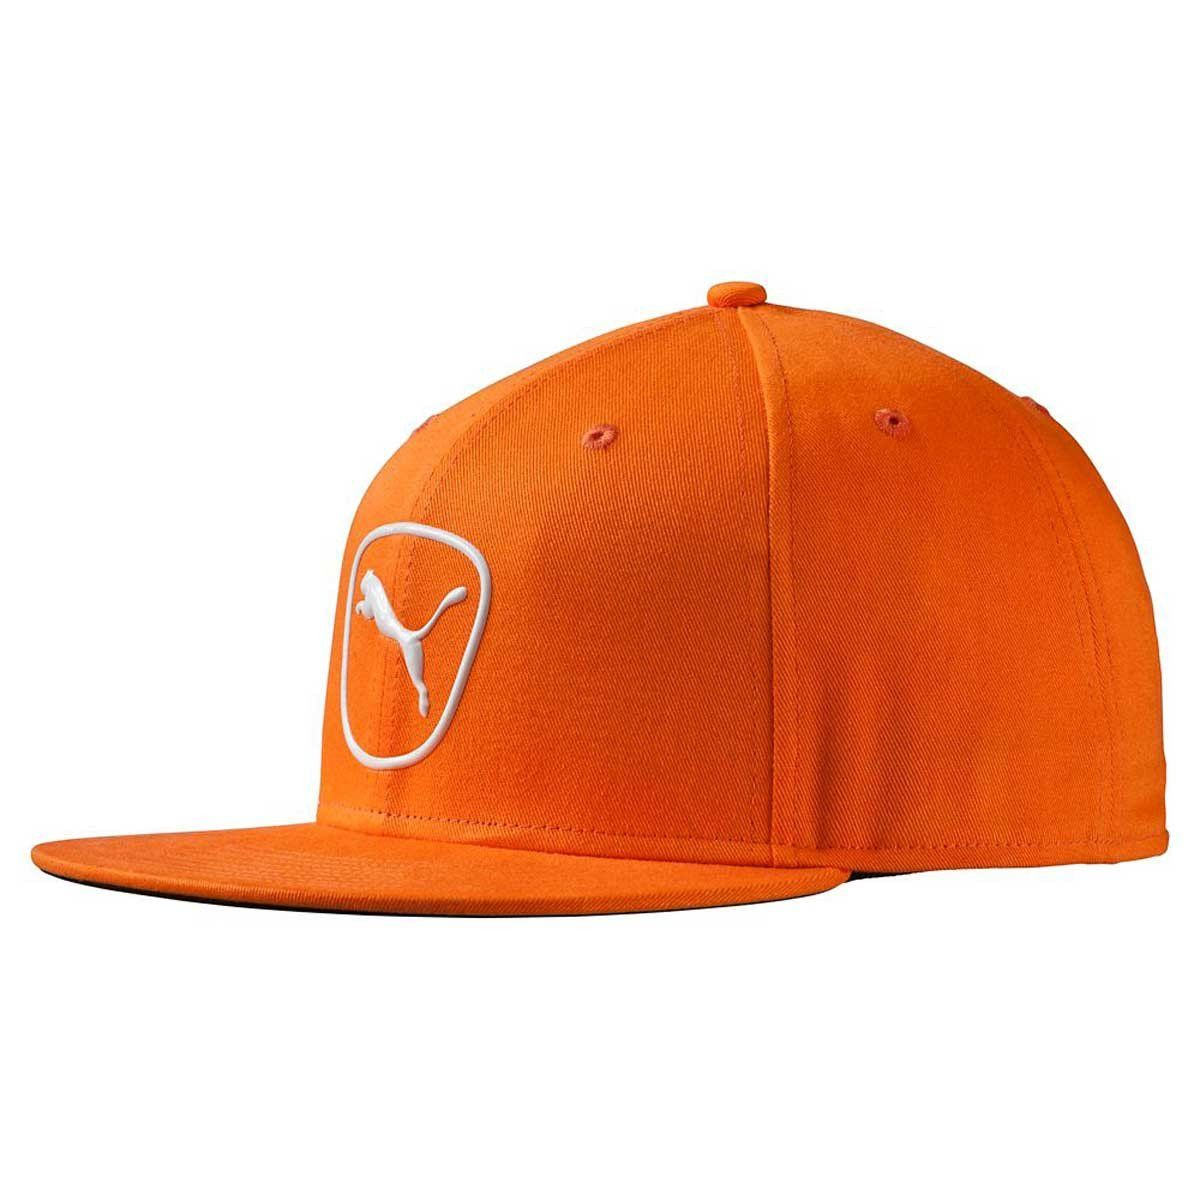 Puma Golf Vibrant Orange/White Cat Patch 2.0 Snapback Cap